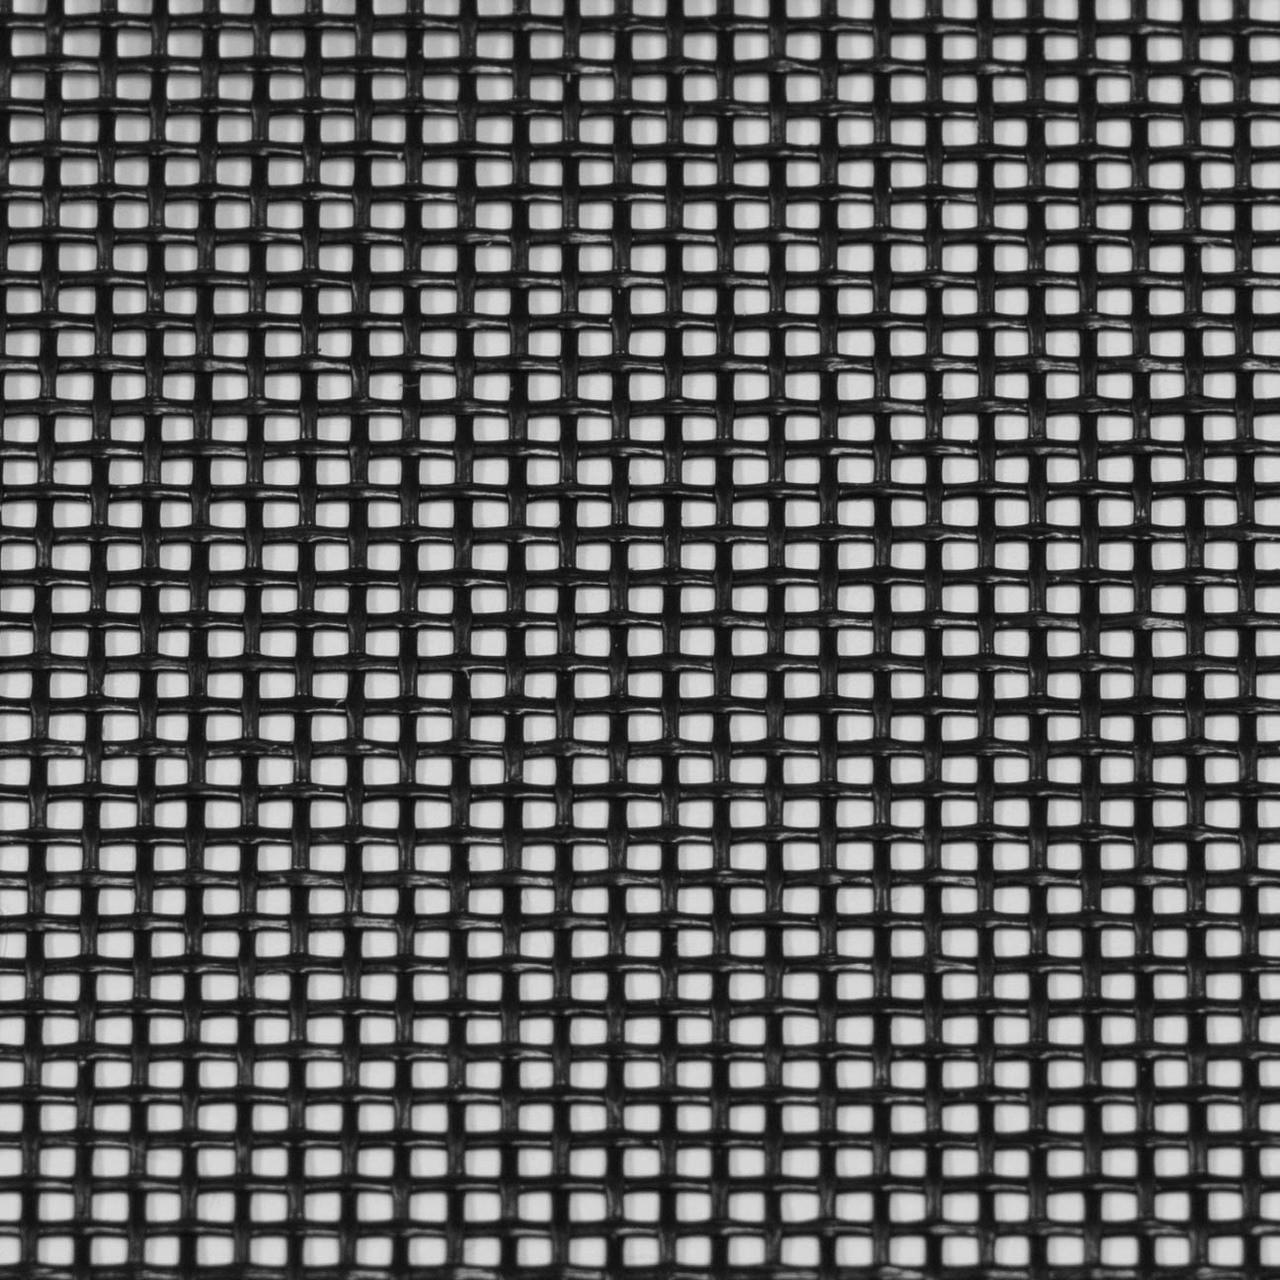 120 Inch x 100 Ft Super Screen Tiny Mesh 20 x 17